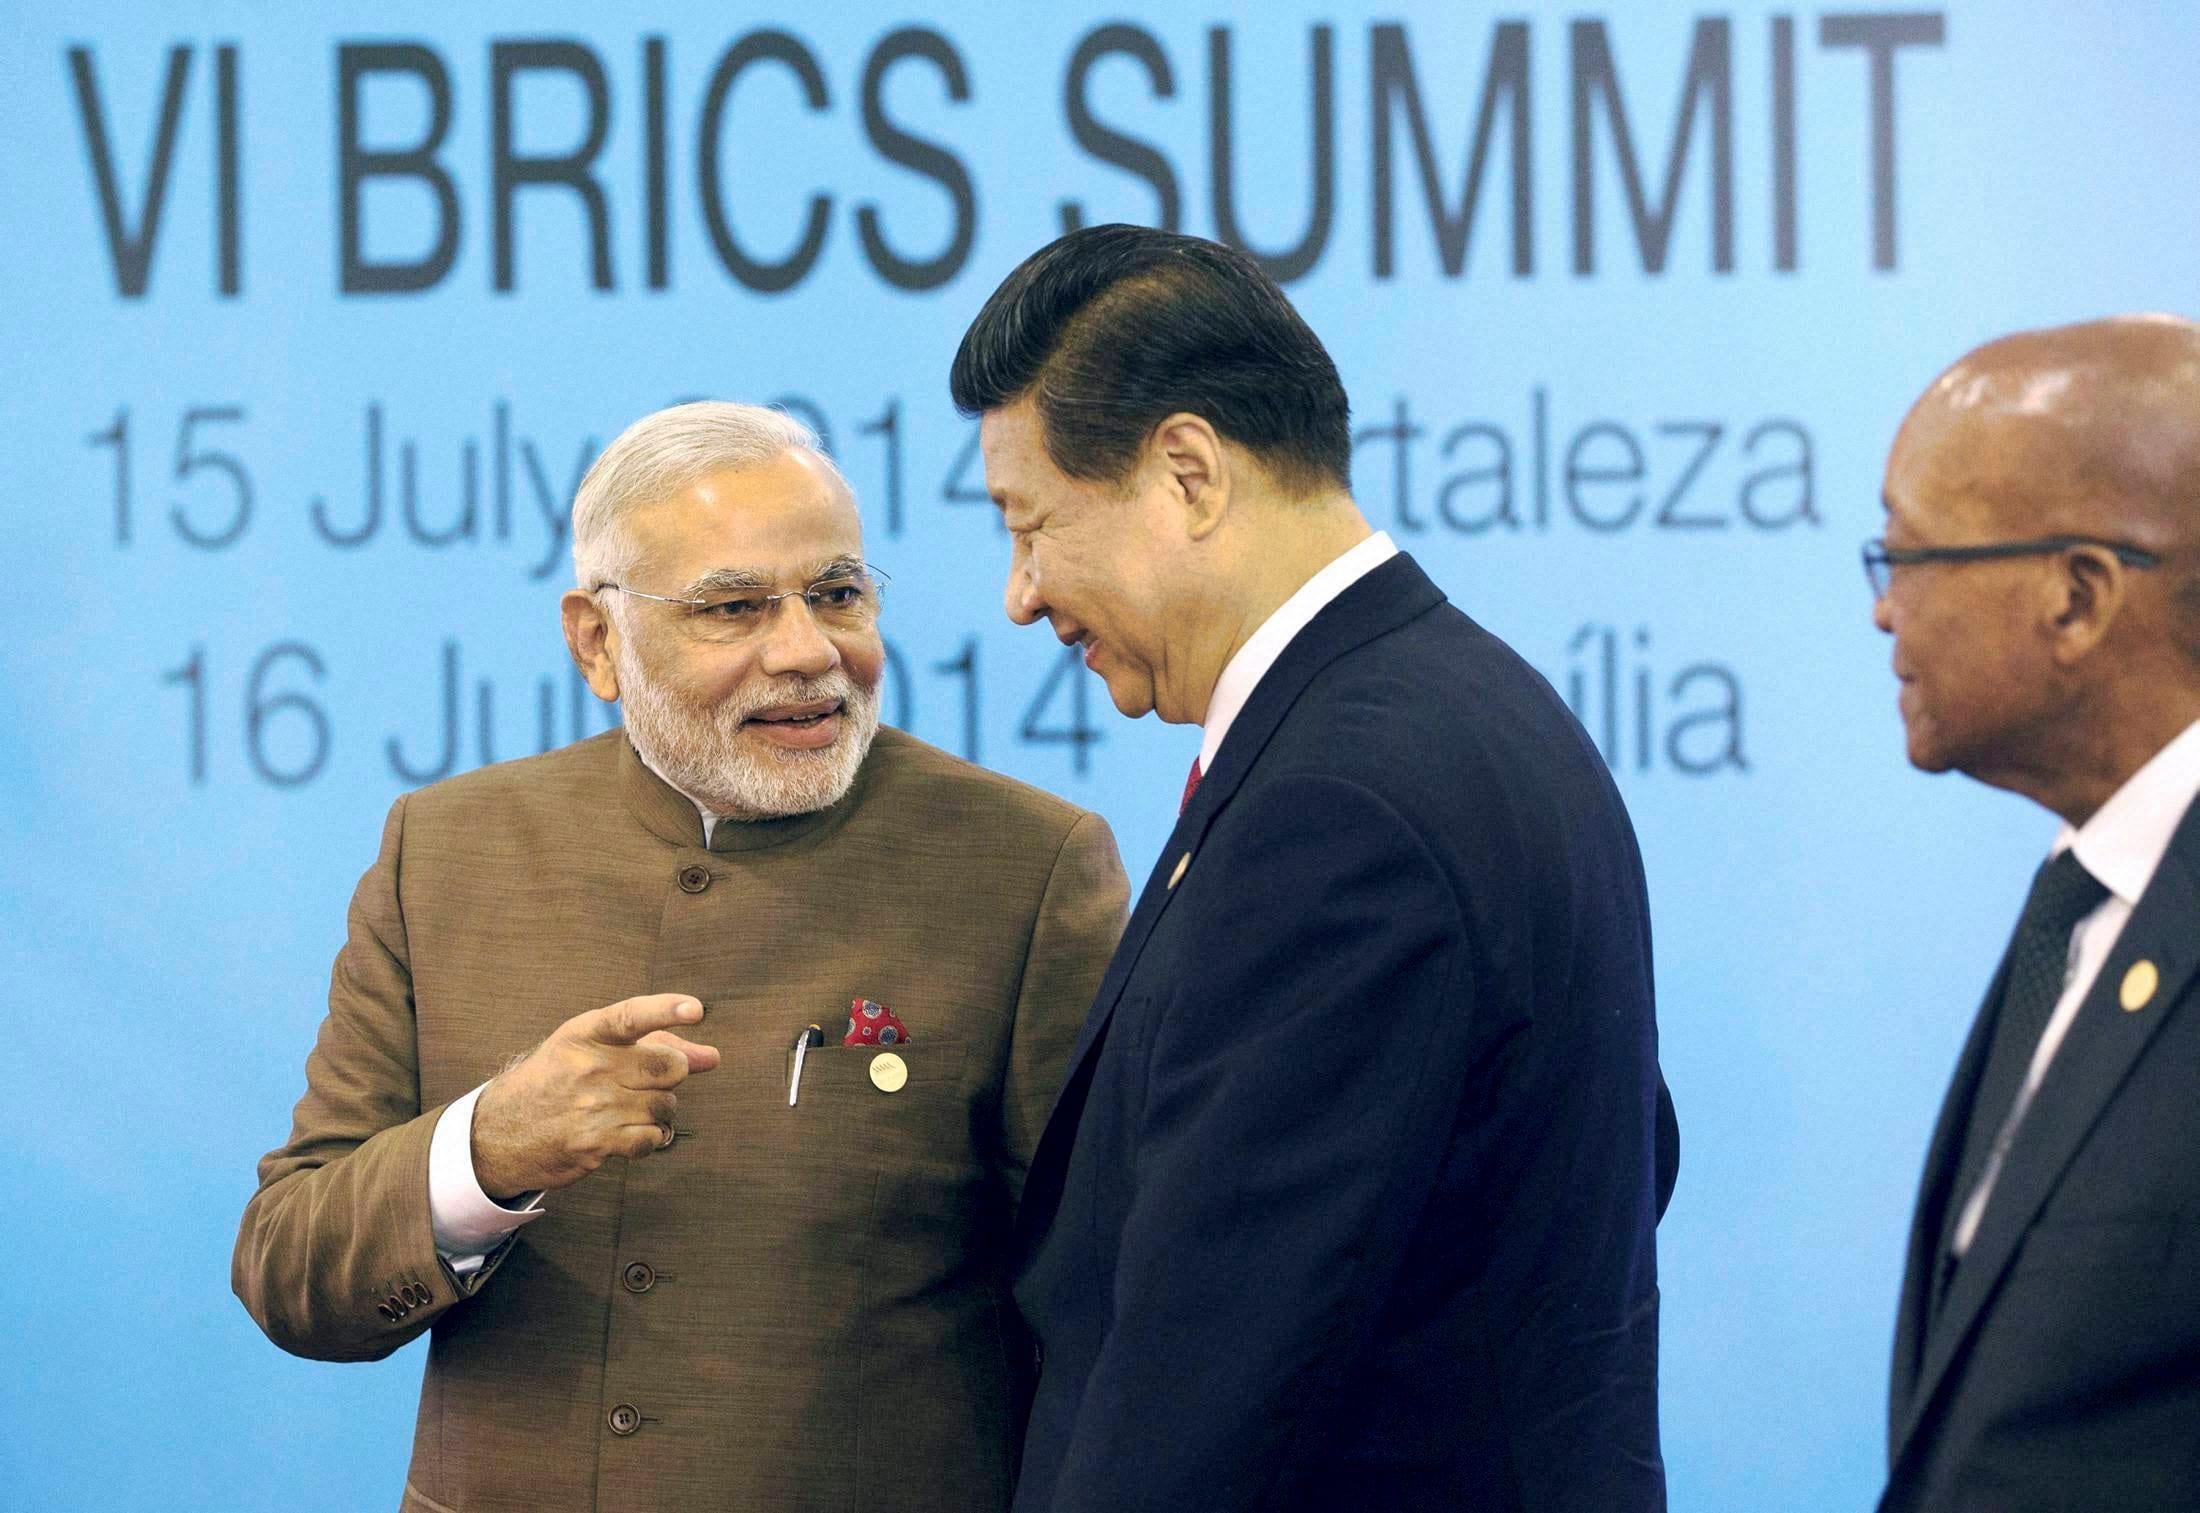 Prime Minister, Narendra Modi, Brazil's, President, Dilma Rousseff, Russian President, Vladimir Putin, Chinese President, Xi Jinping, South African President, Jacob Zuma, BRICS summit, Ceara events, Fortaleza, Brazil